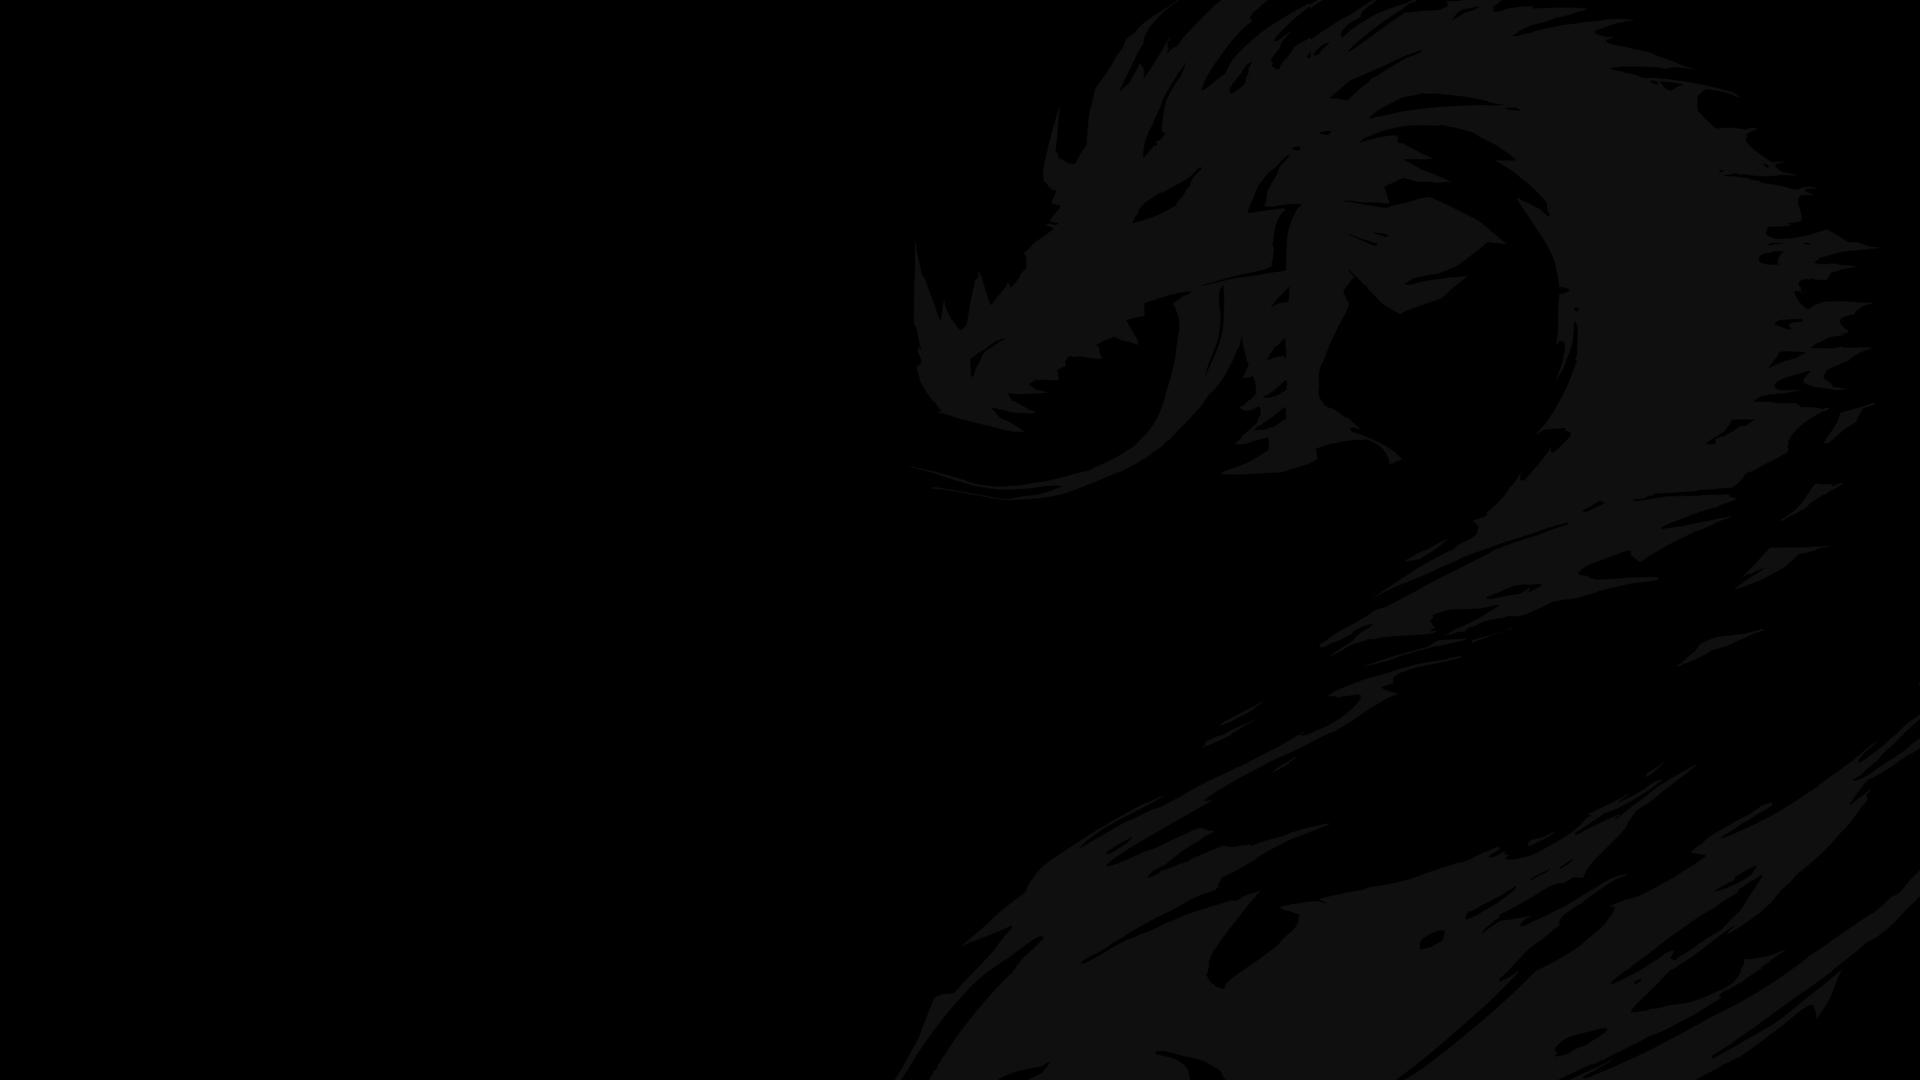 Solid Dark Grey Background Plain Black Wallpaper 1920x1080